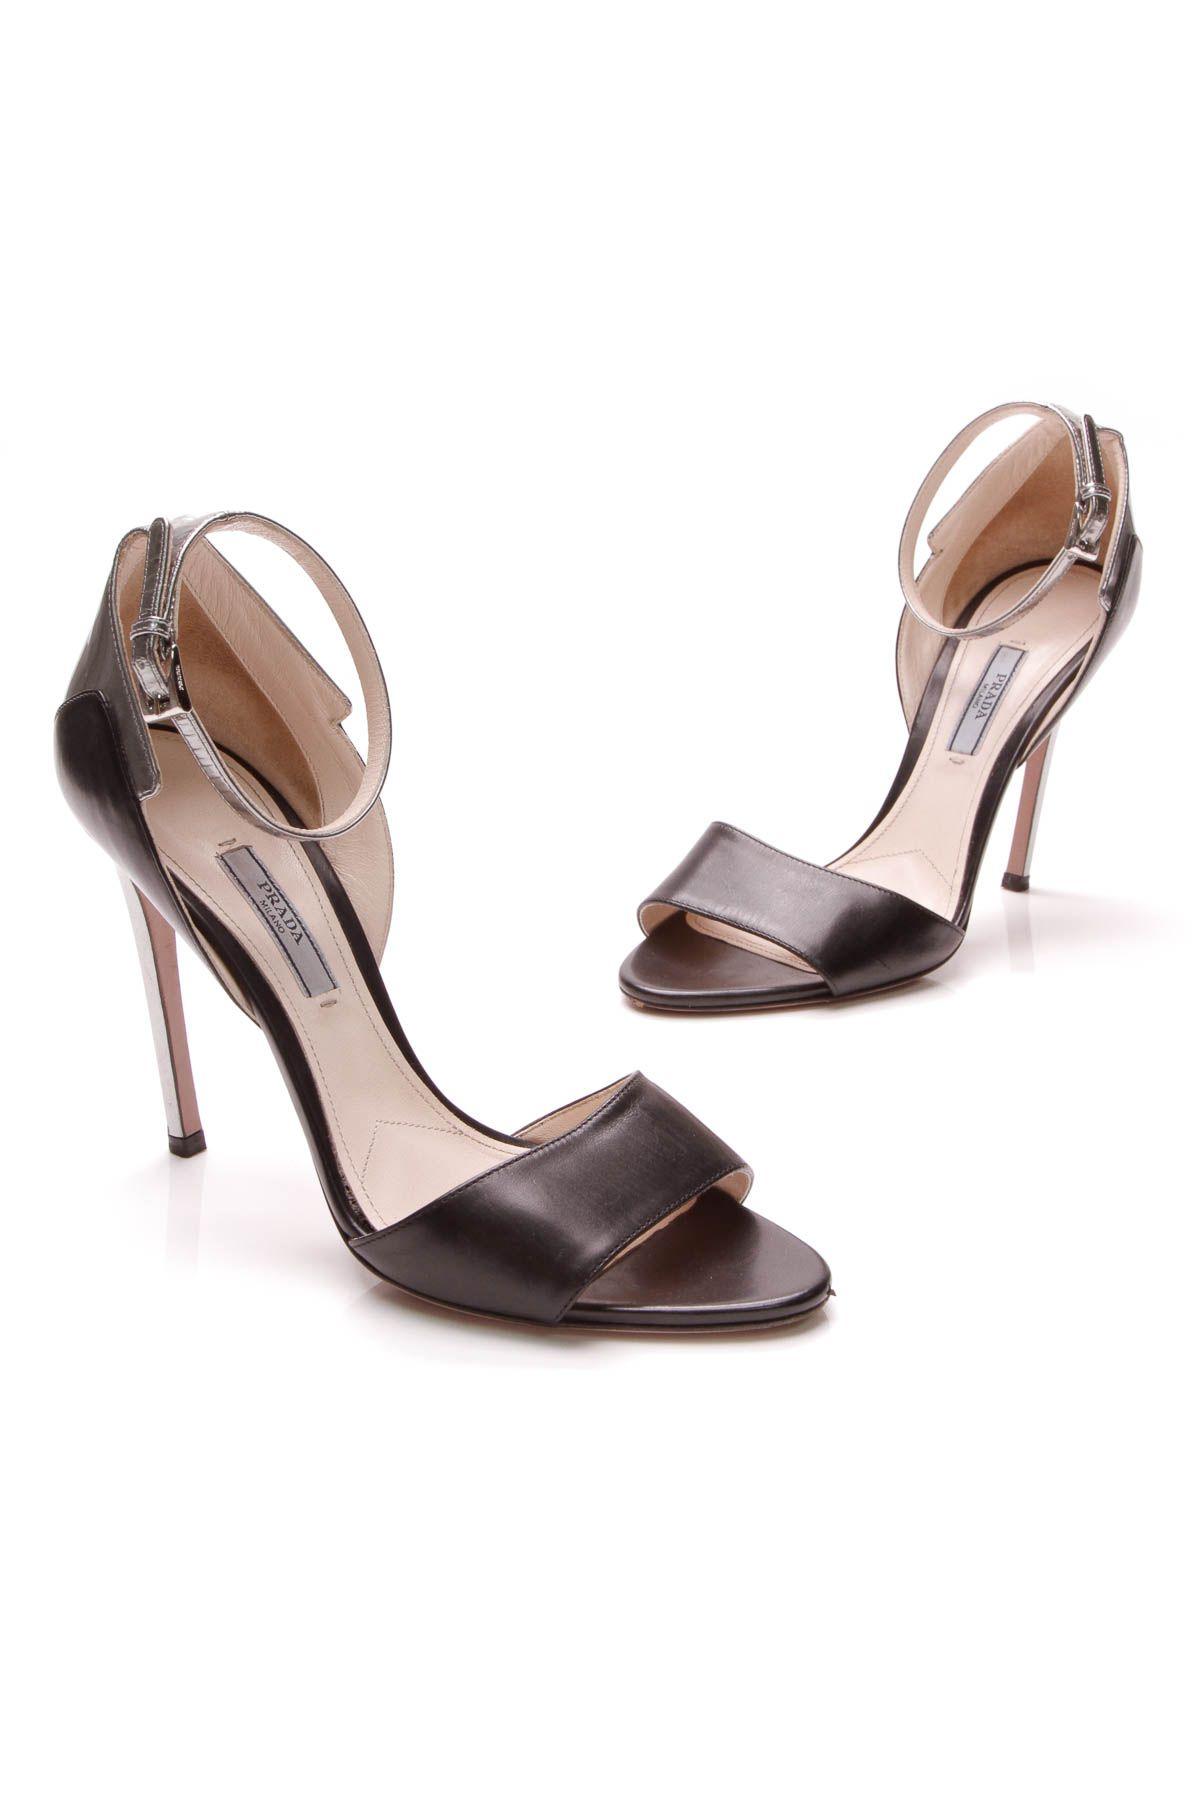 d83573ce719 Prada Ankle Strap Sandal Heels - Black   Silver Sandal Heels